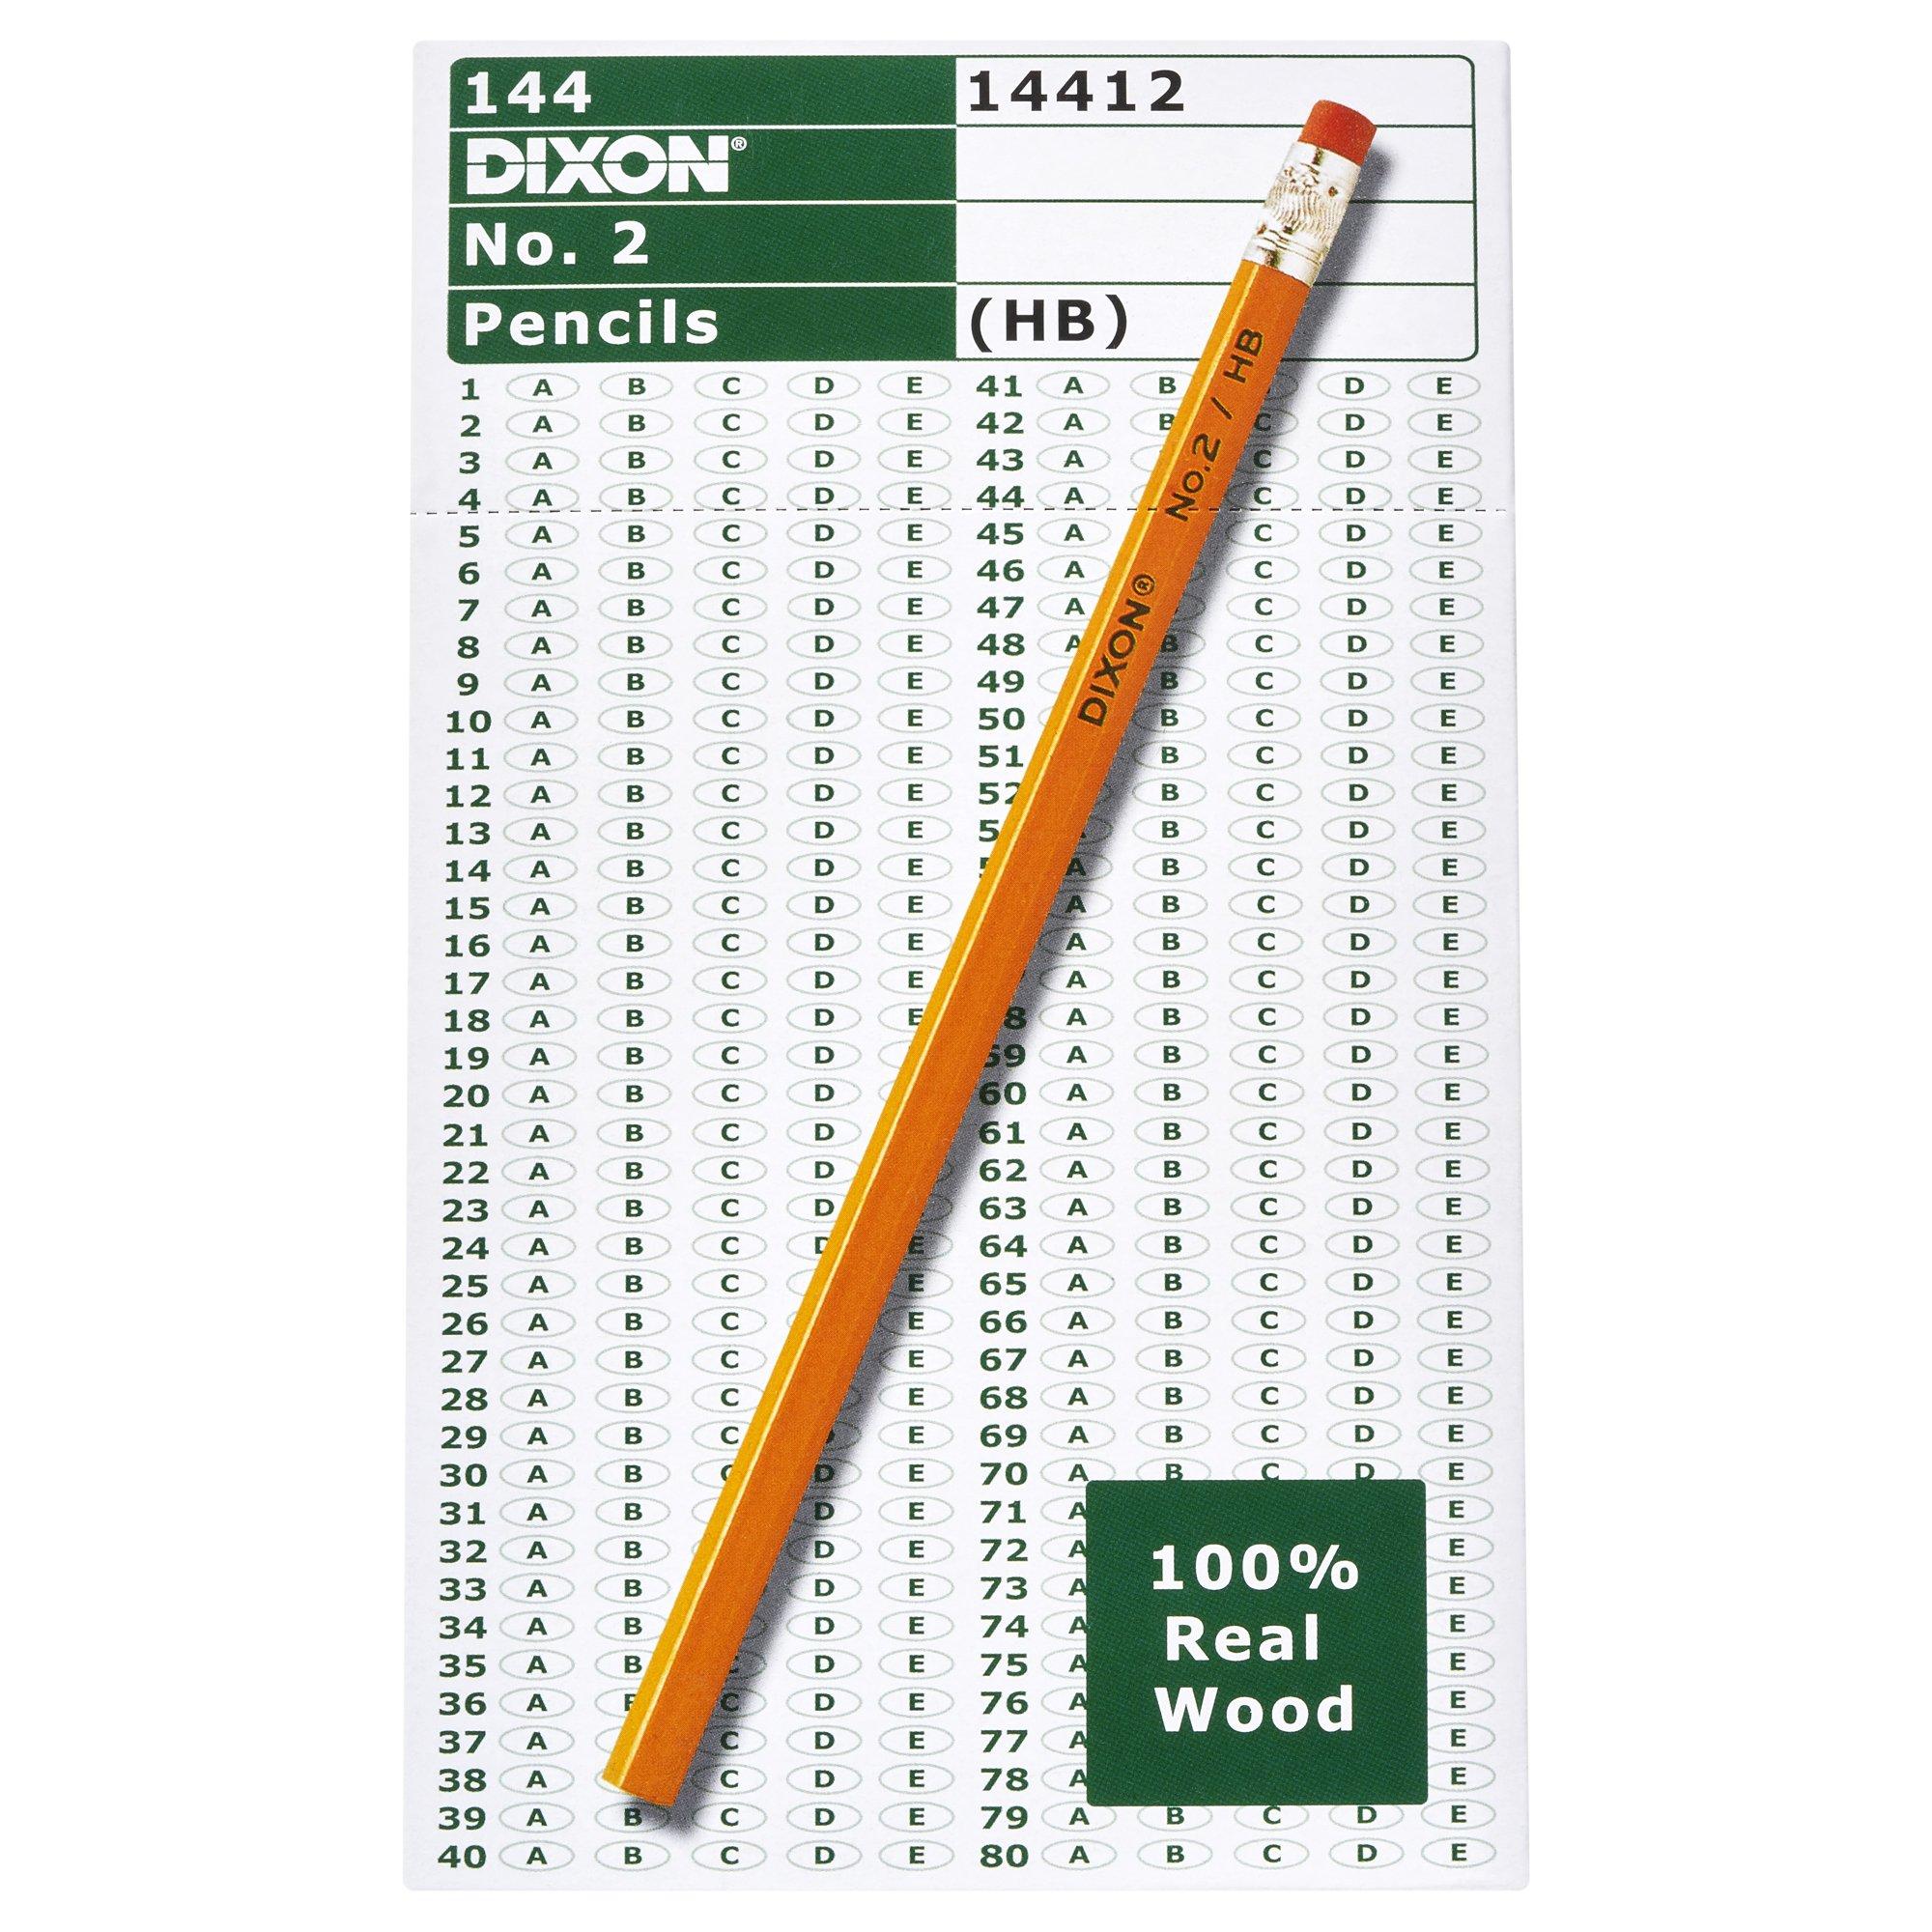 Dixon No. 2 Yellow Pencils, Wood-Cased, Black Core, #2 HB Soft, 144 Count, Boxed (14412) by Dixon